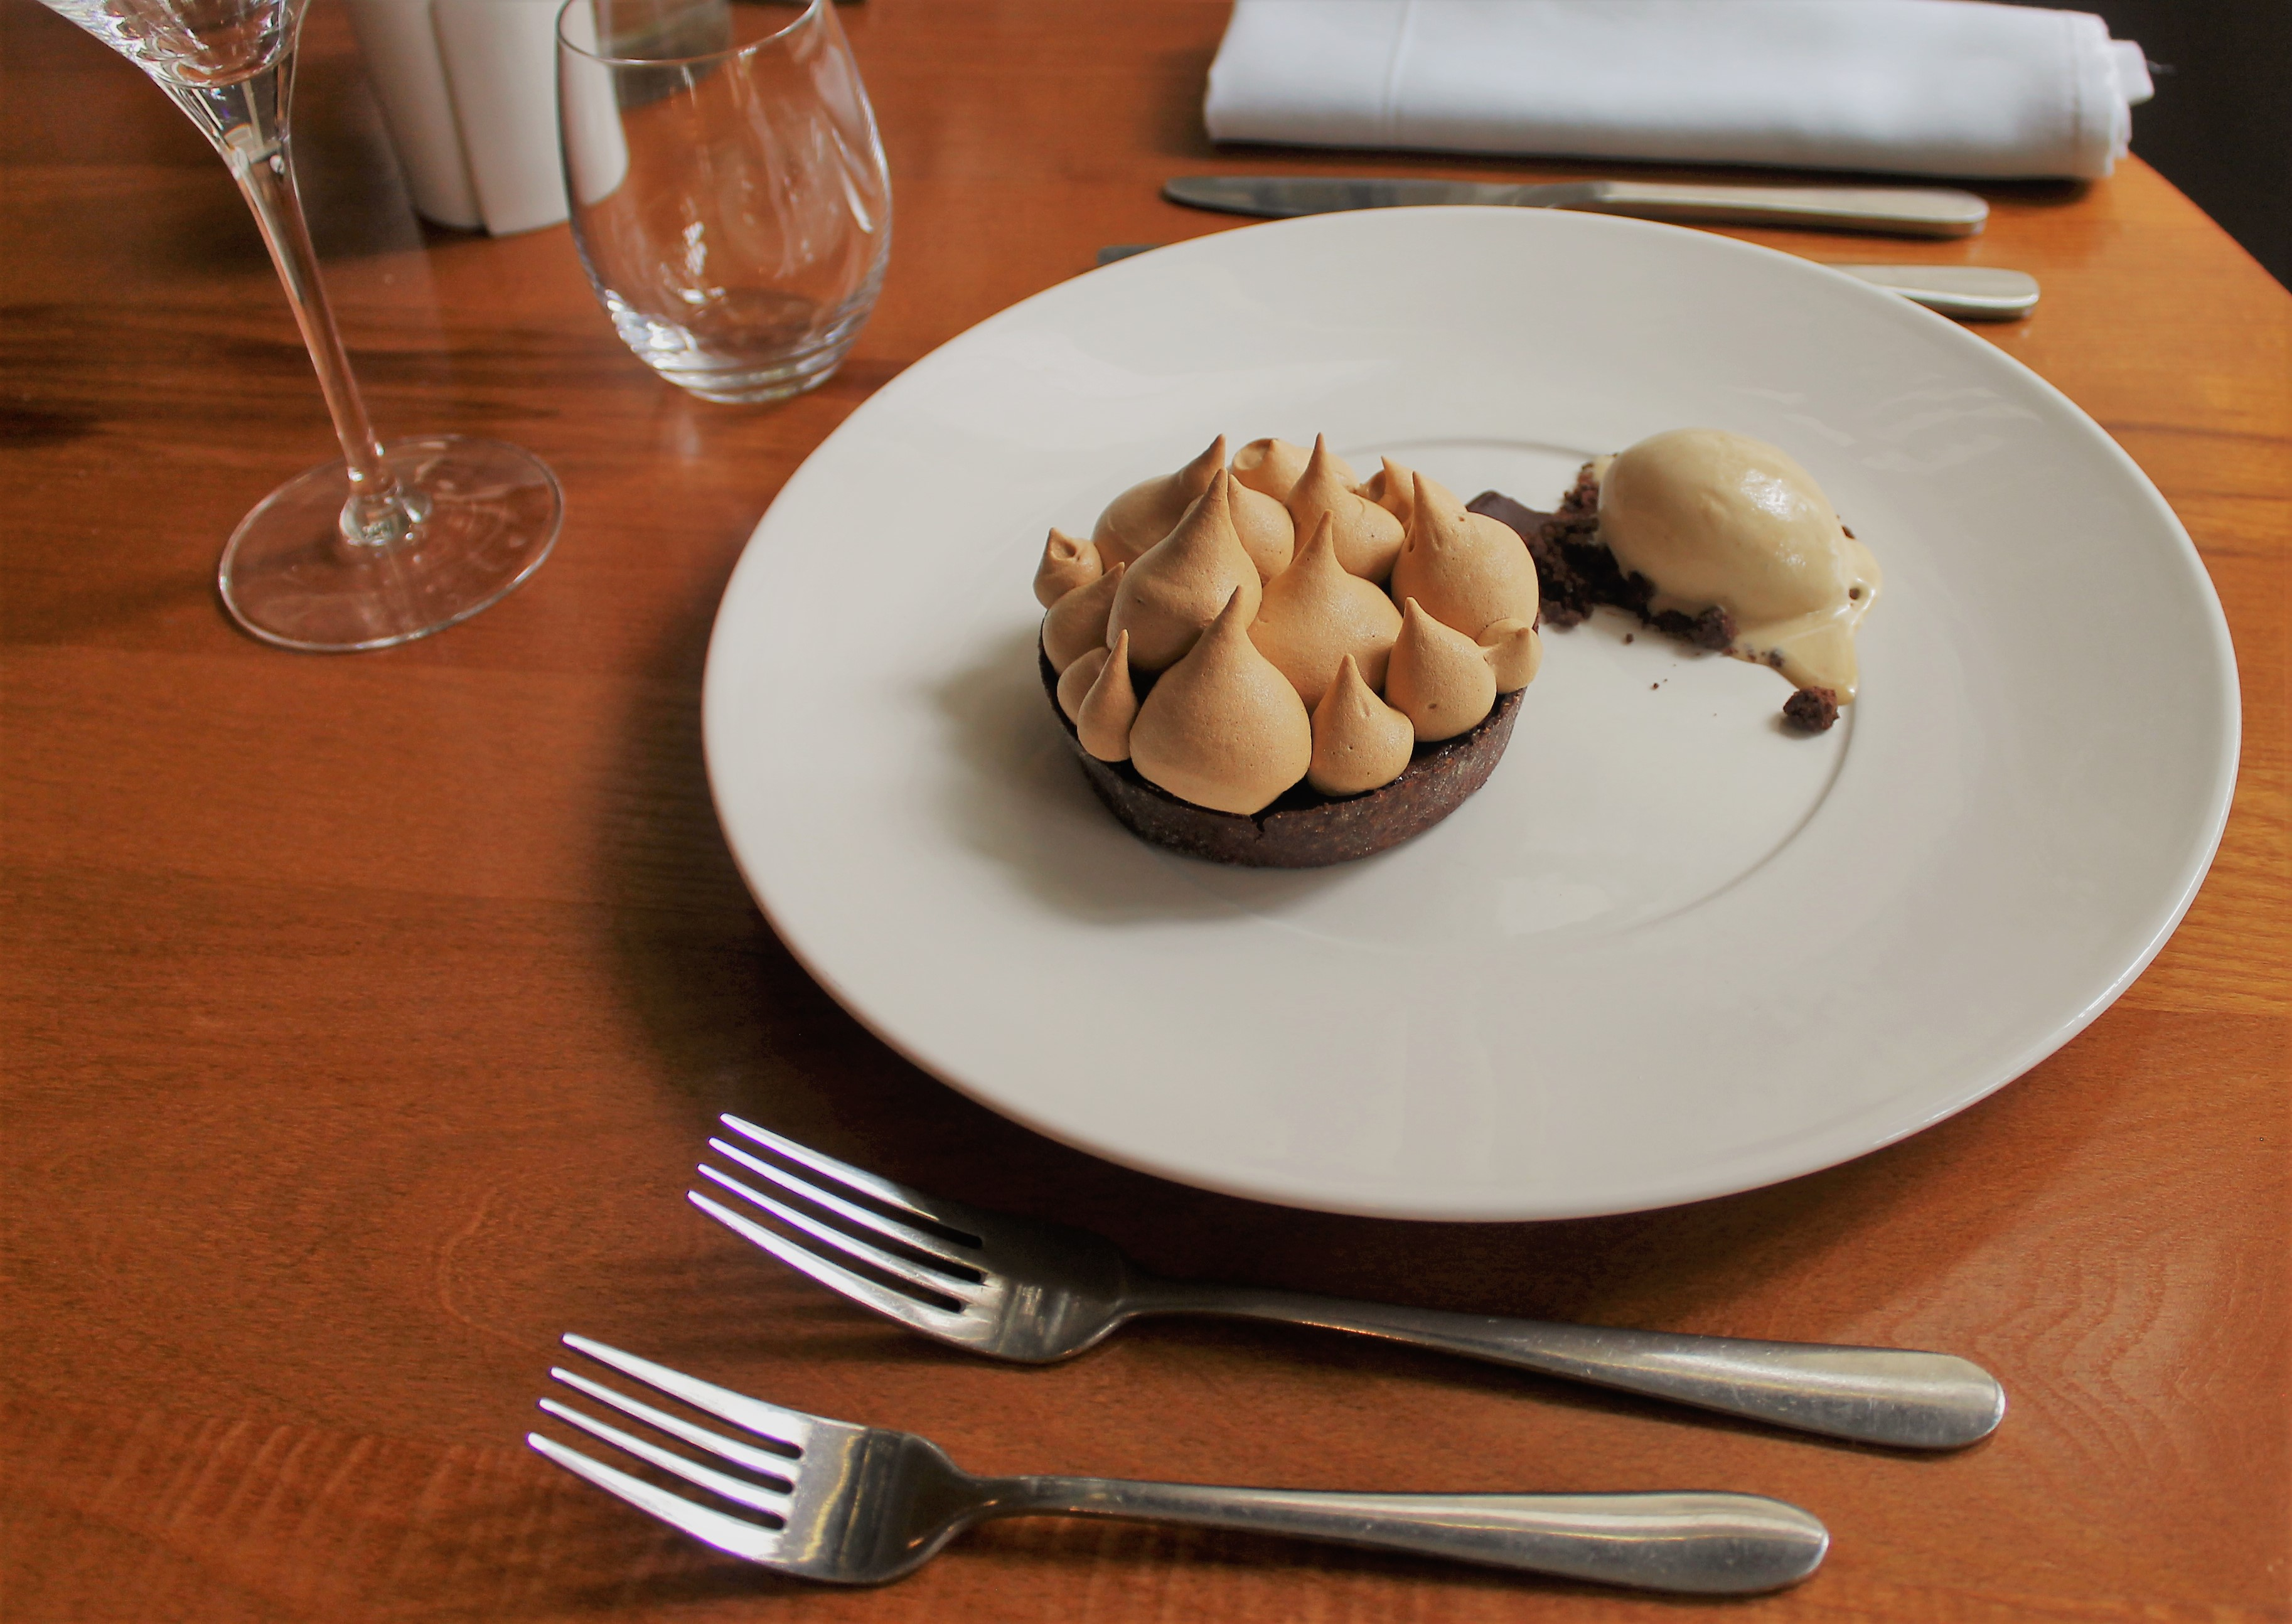 https://www.thestaffcanteen.com/public/js/tinymce/plugins/moxiemanager/data/files/Mocha Meringue Pie in The Arbor Restaurant   Copy.JPG